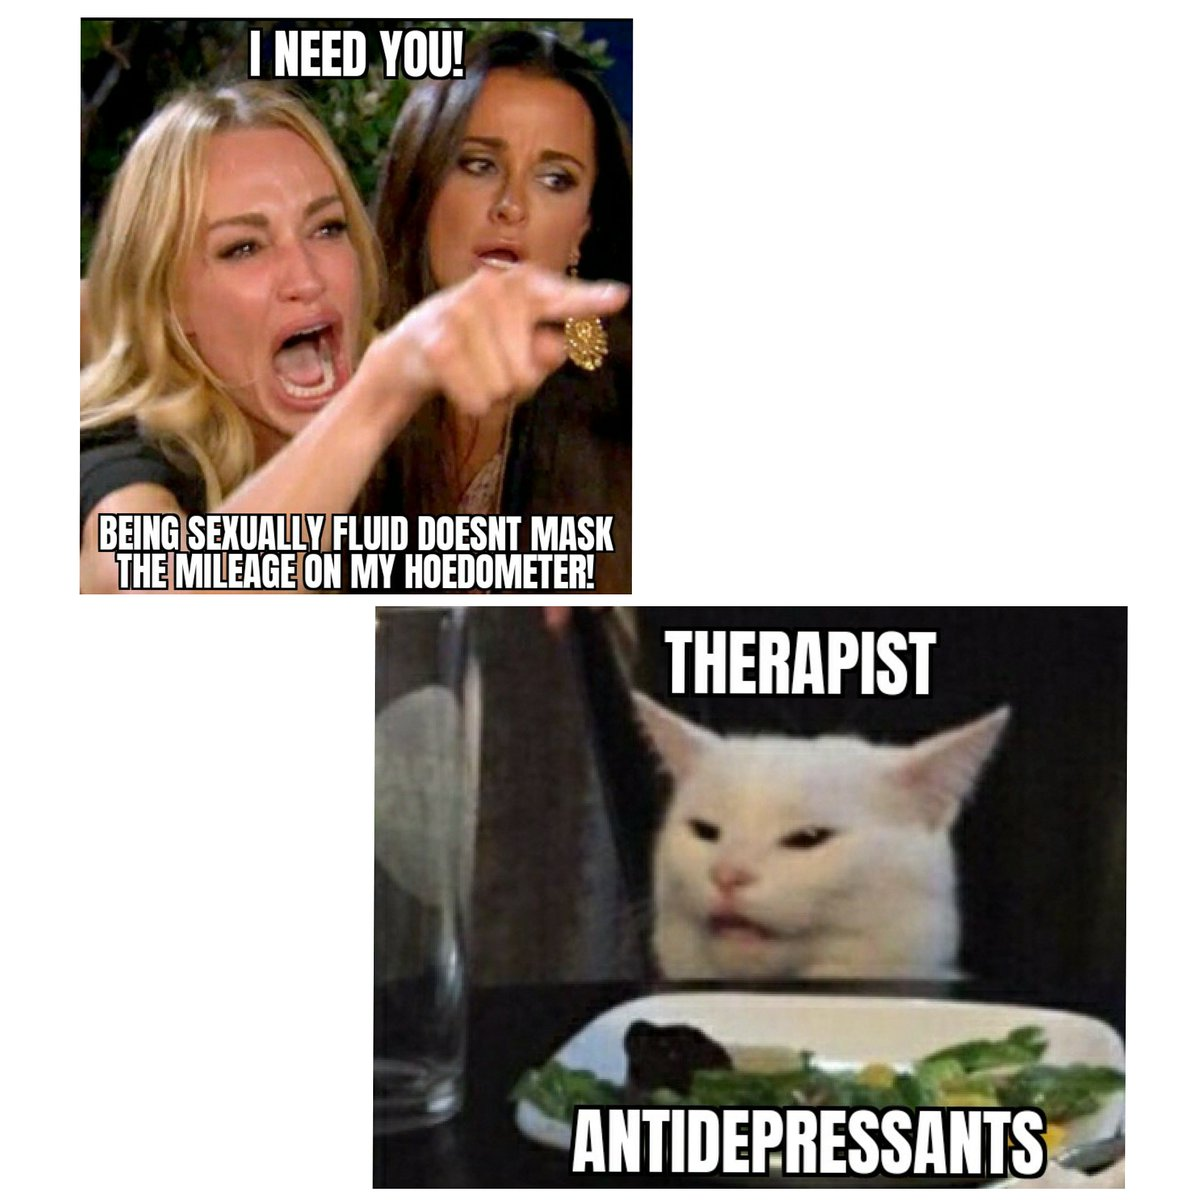 #memes #funnymemes #feministmemes #comedy #funny #jokes #chicodeoro12 #society #SocialCommentary #SocialObservation #sociology #psychology #Philosophypic.twitter.com/6590Q5sjtS